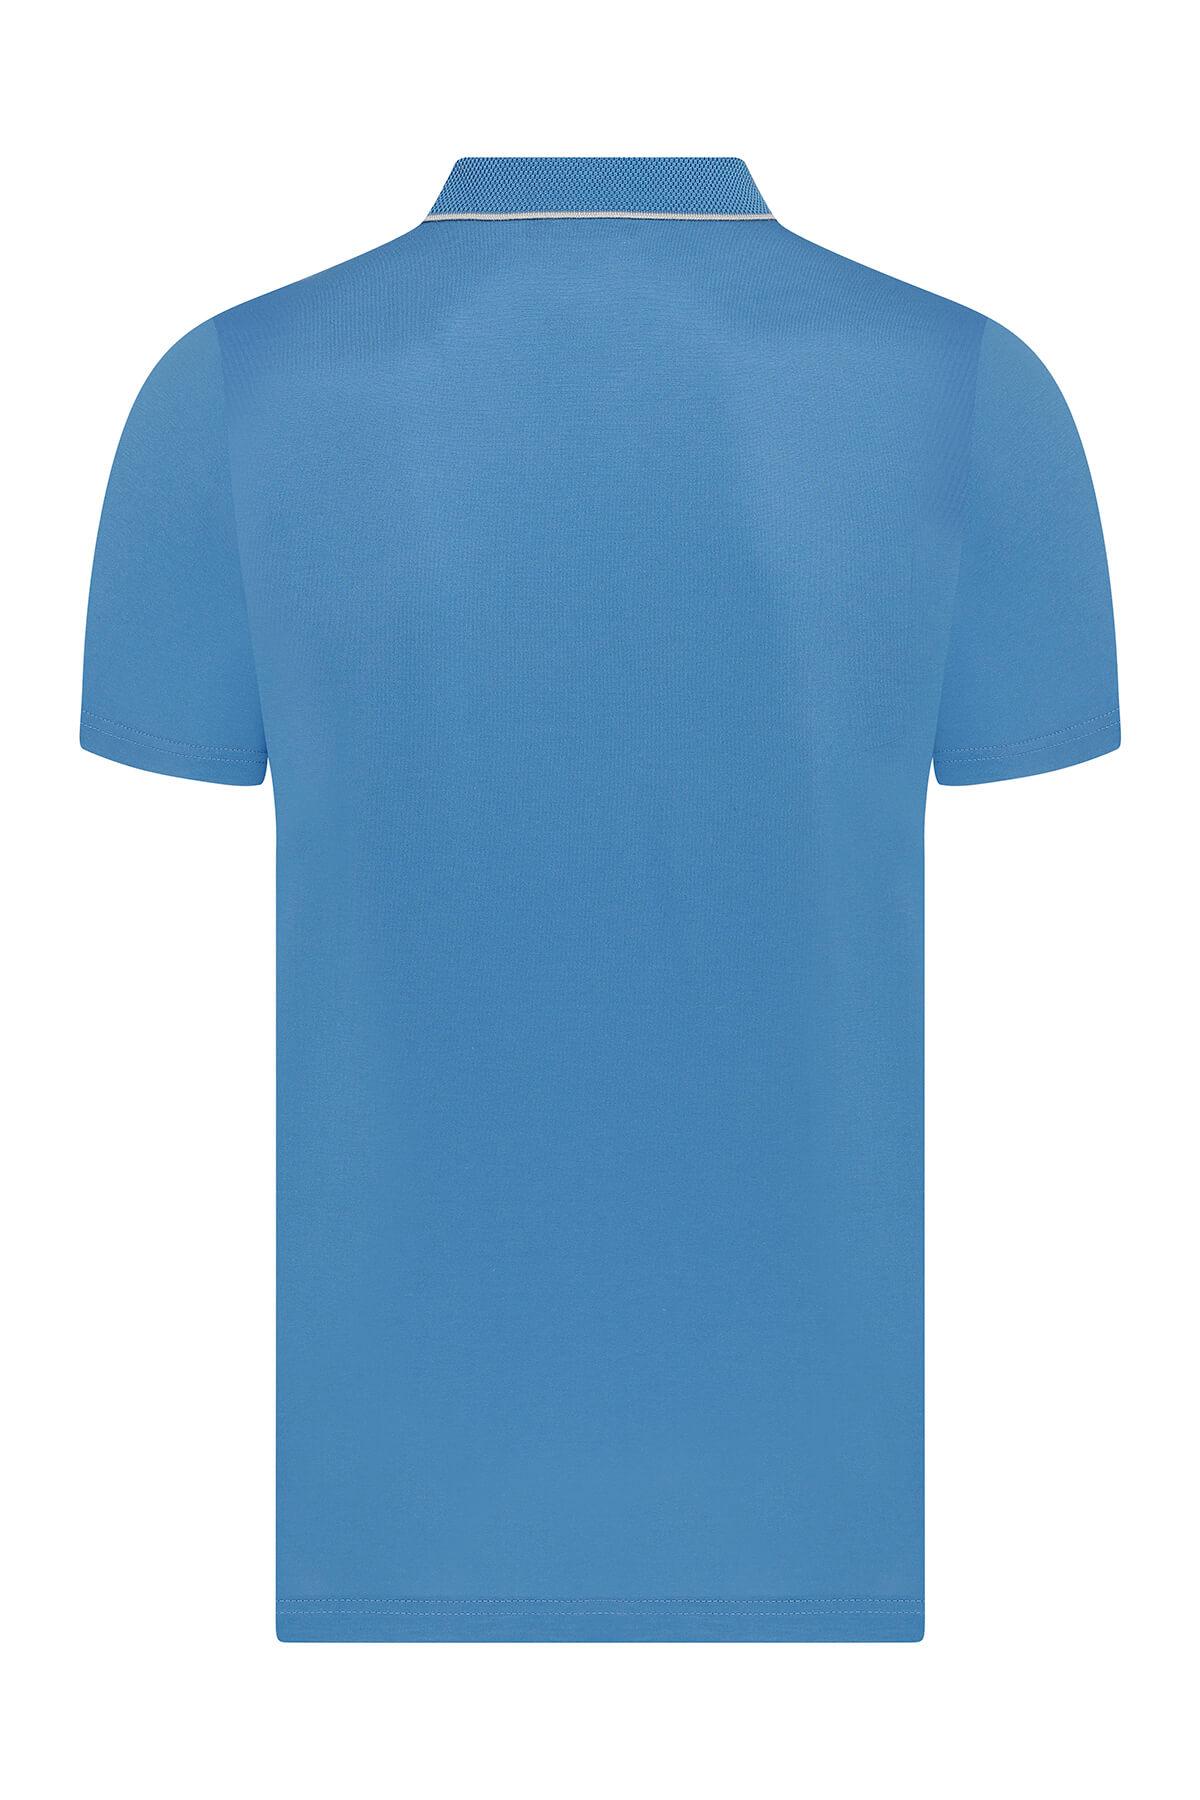 Mavi Polo Yaka Tişört - Thumbnail